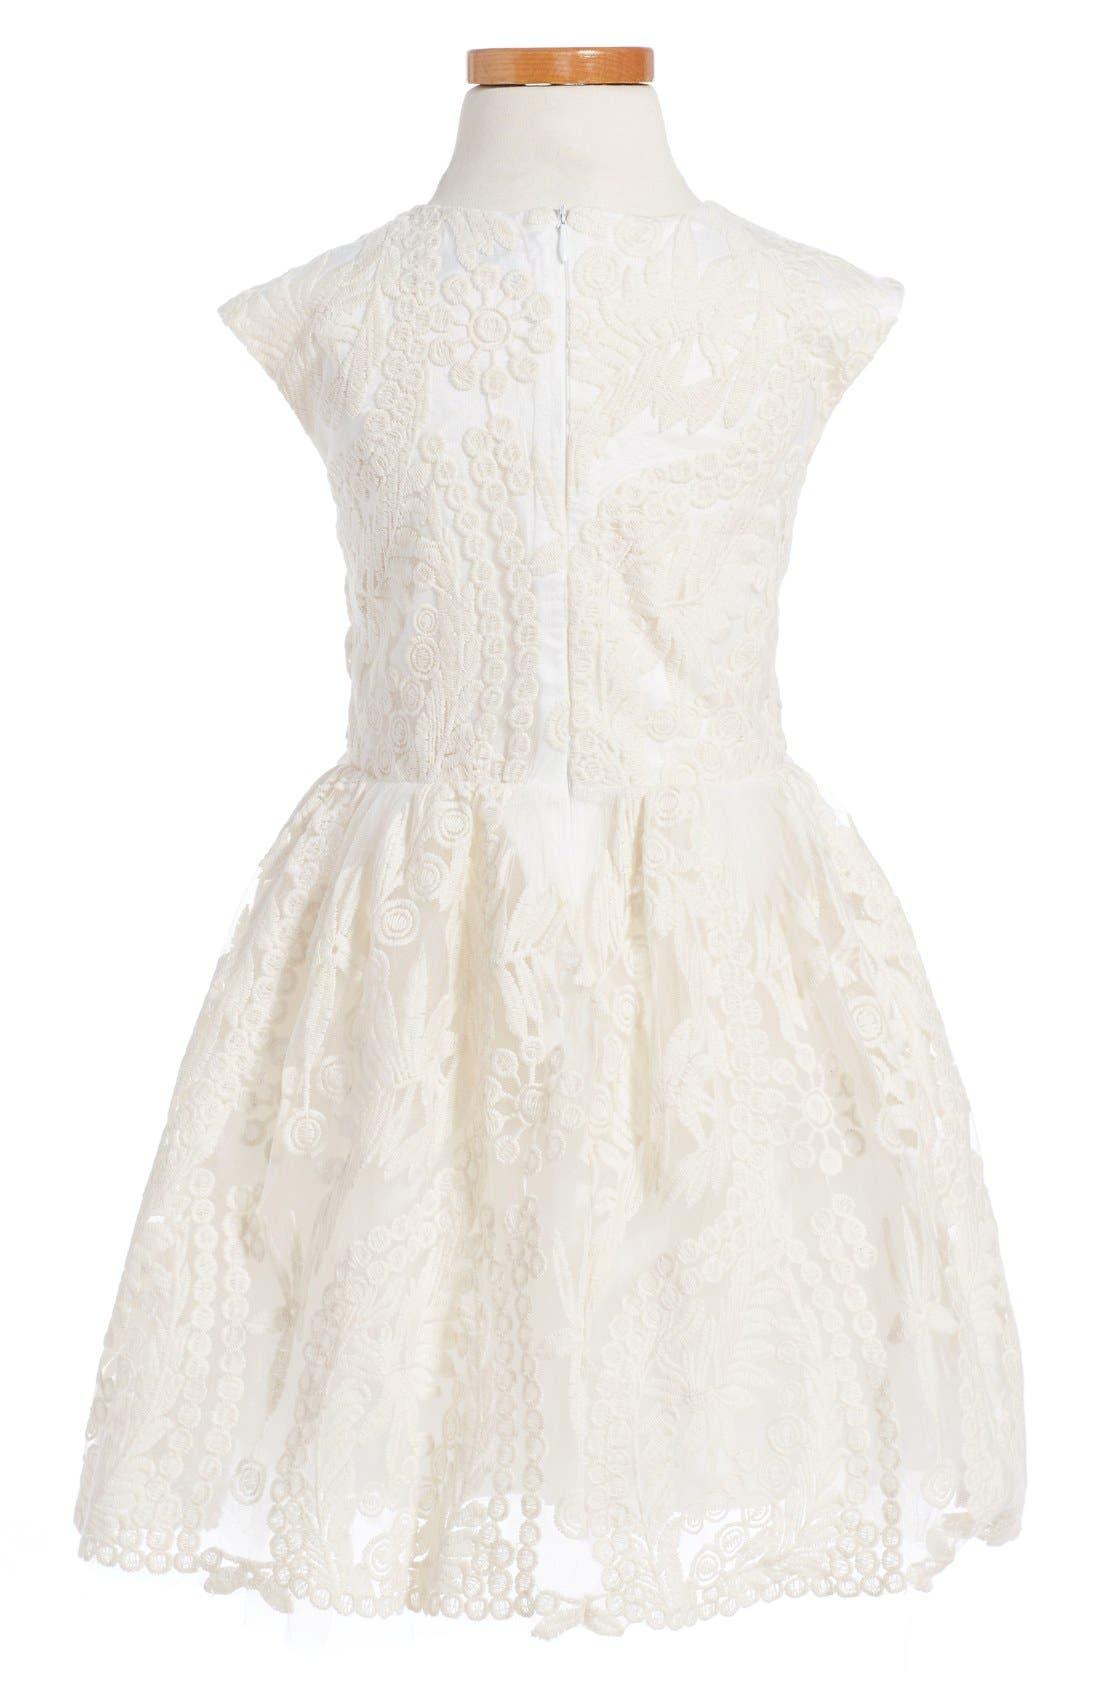 HALABALOO,                             Embroidered Flower Dress,                             Alternate thumbnail 3, color,                             900